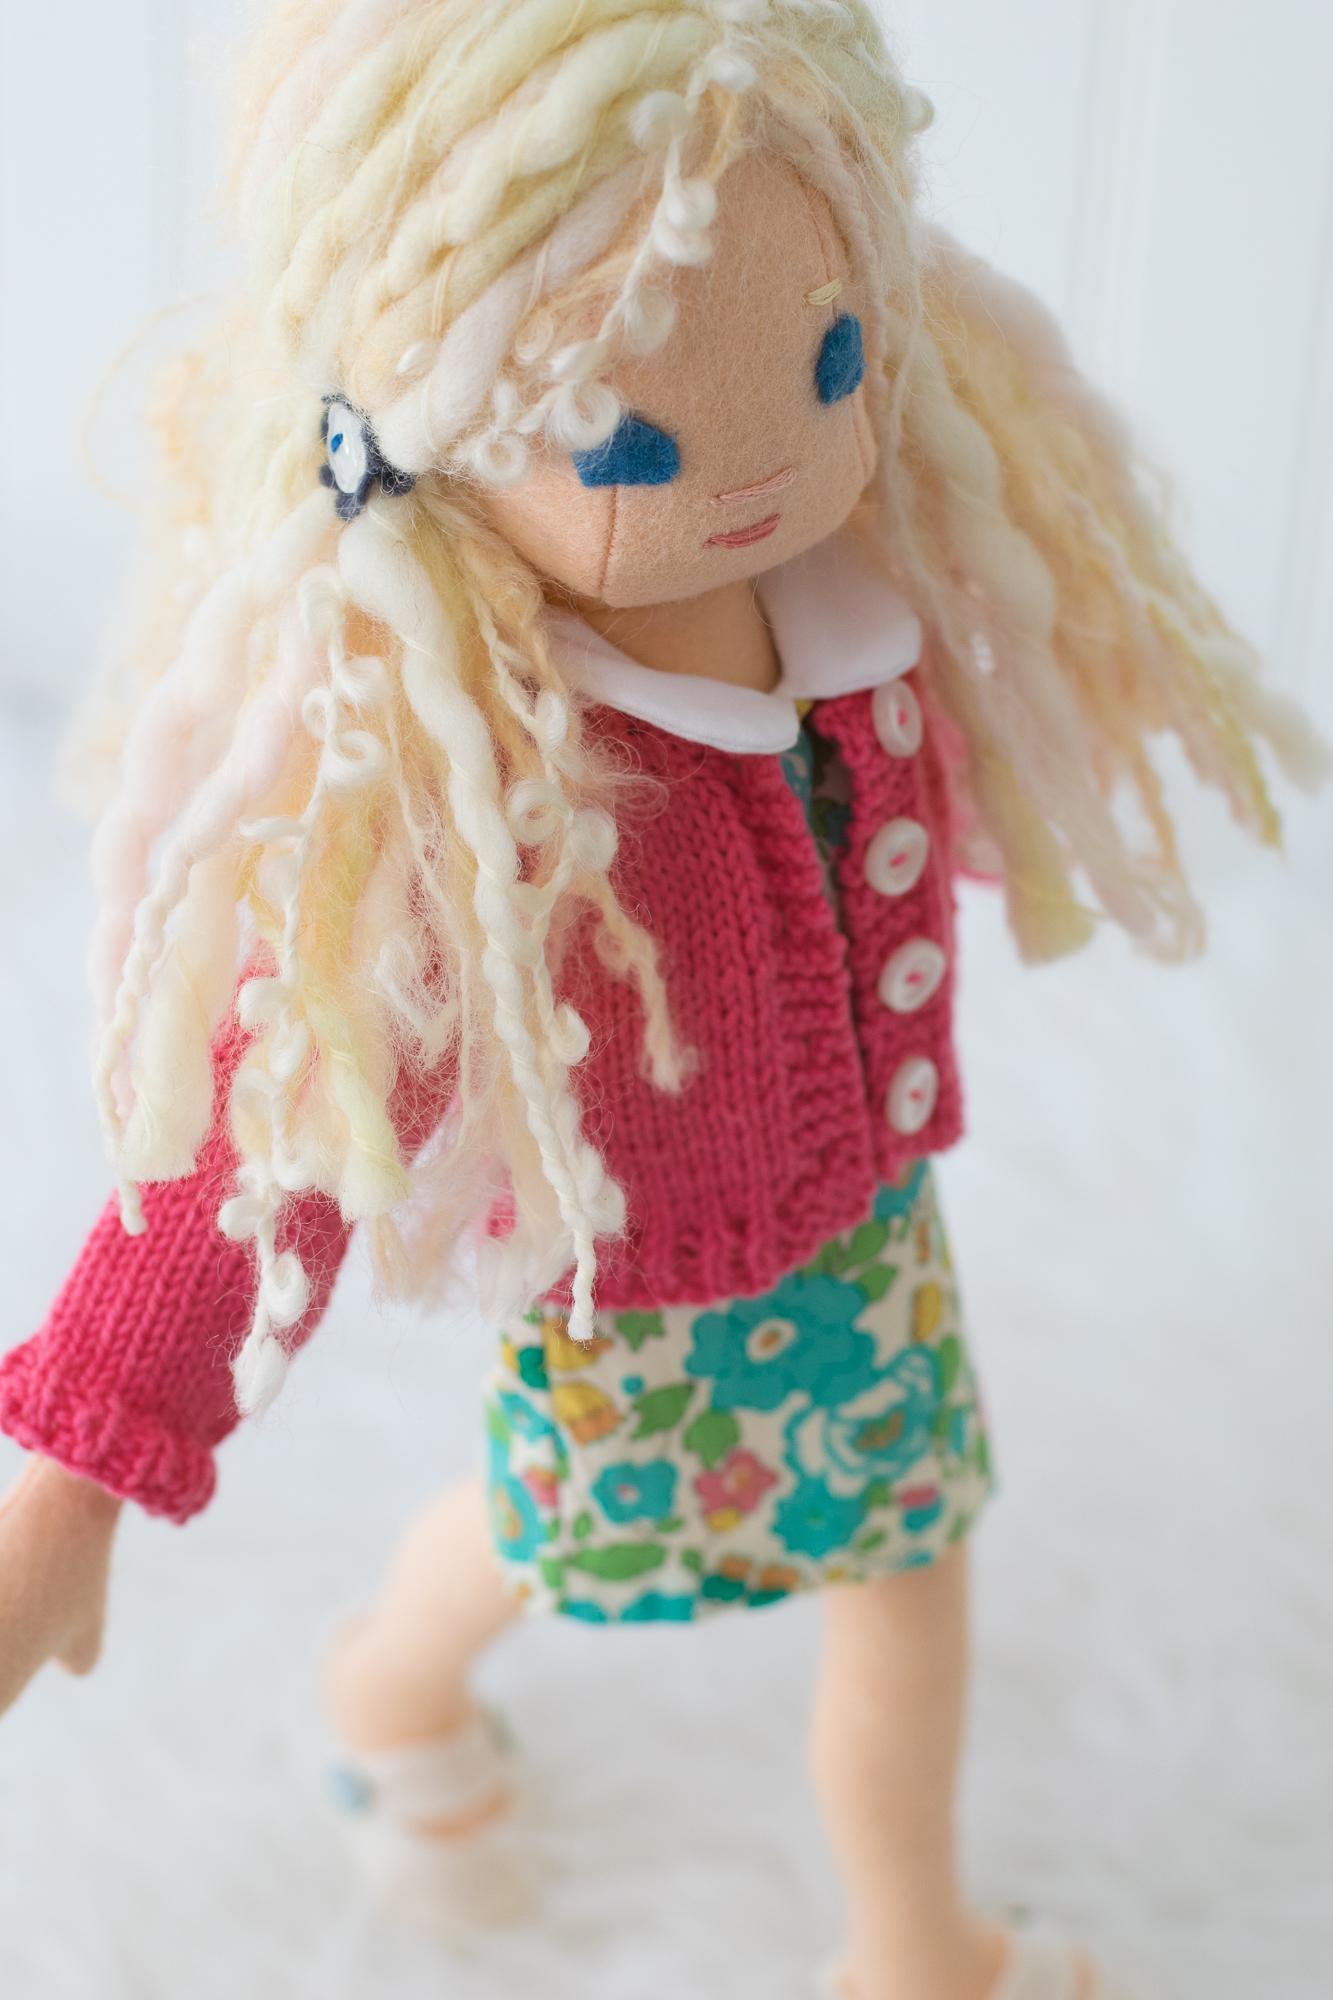 Gallery of Dolls-22.jpg